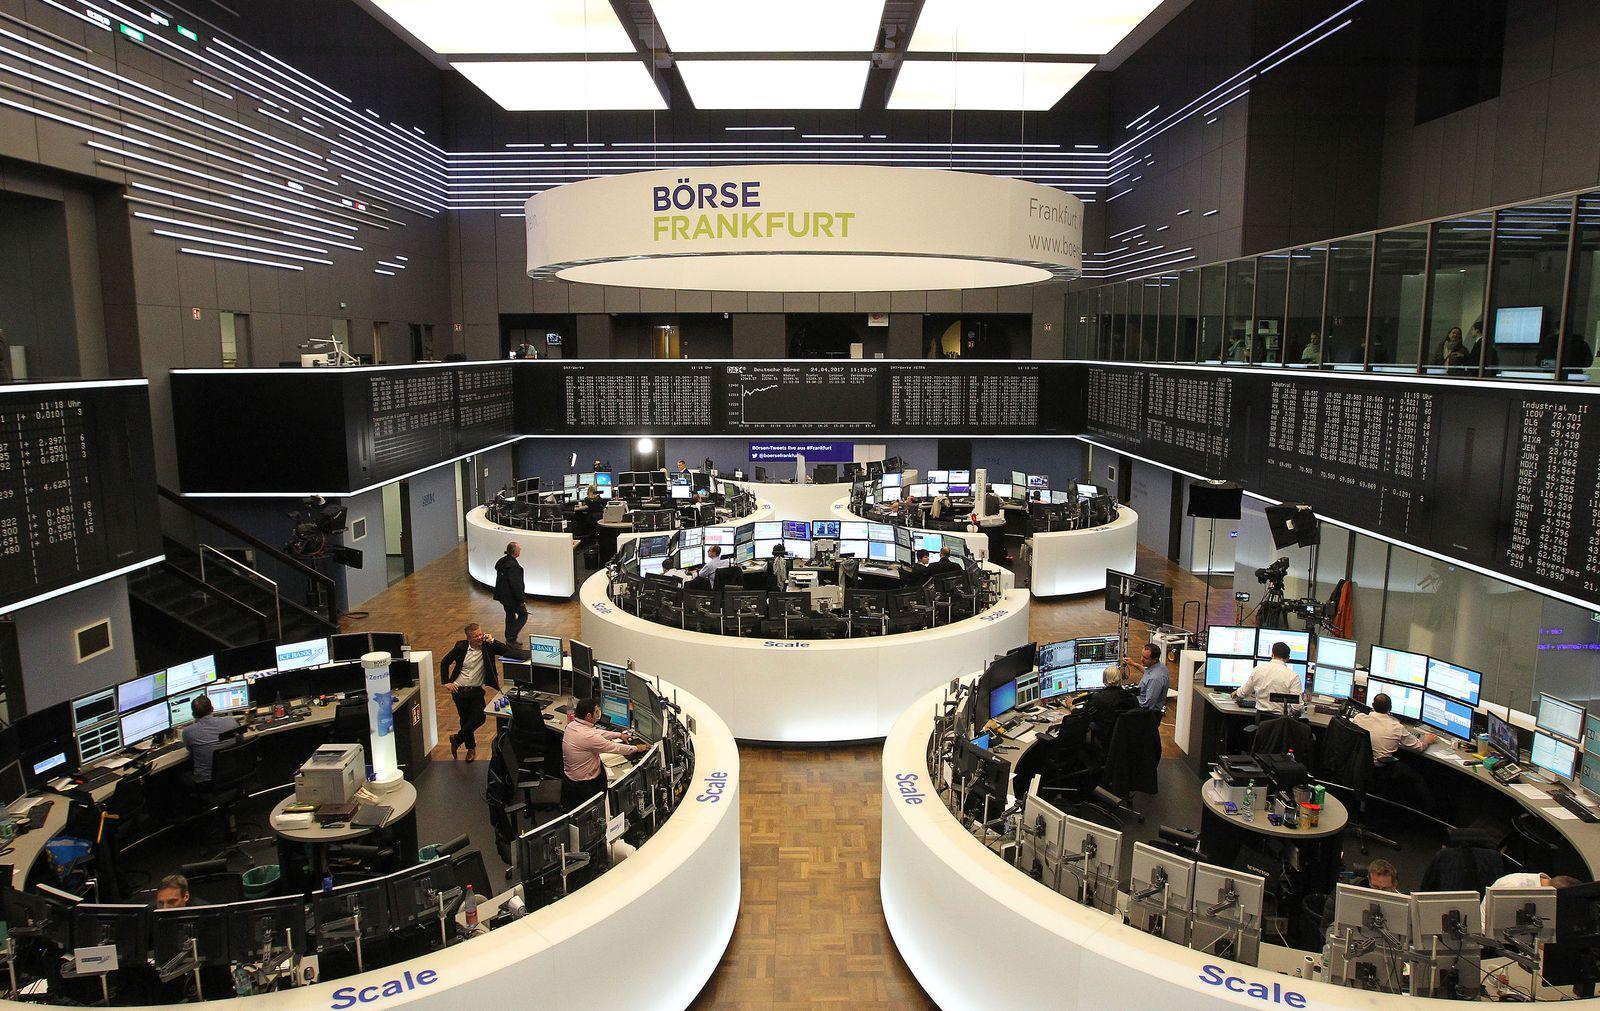 VIDEOTEASER_GERMANY-FRANCE-EUROPE-STOCKS Börse Frankfurt